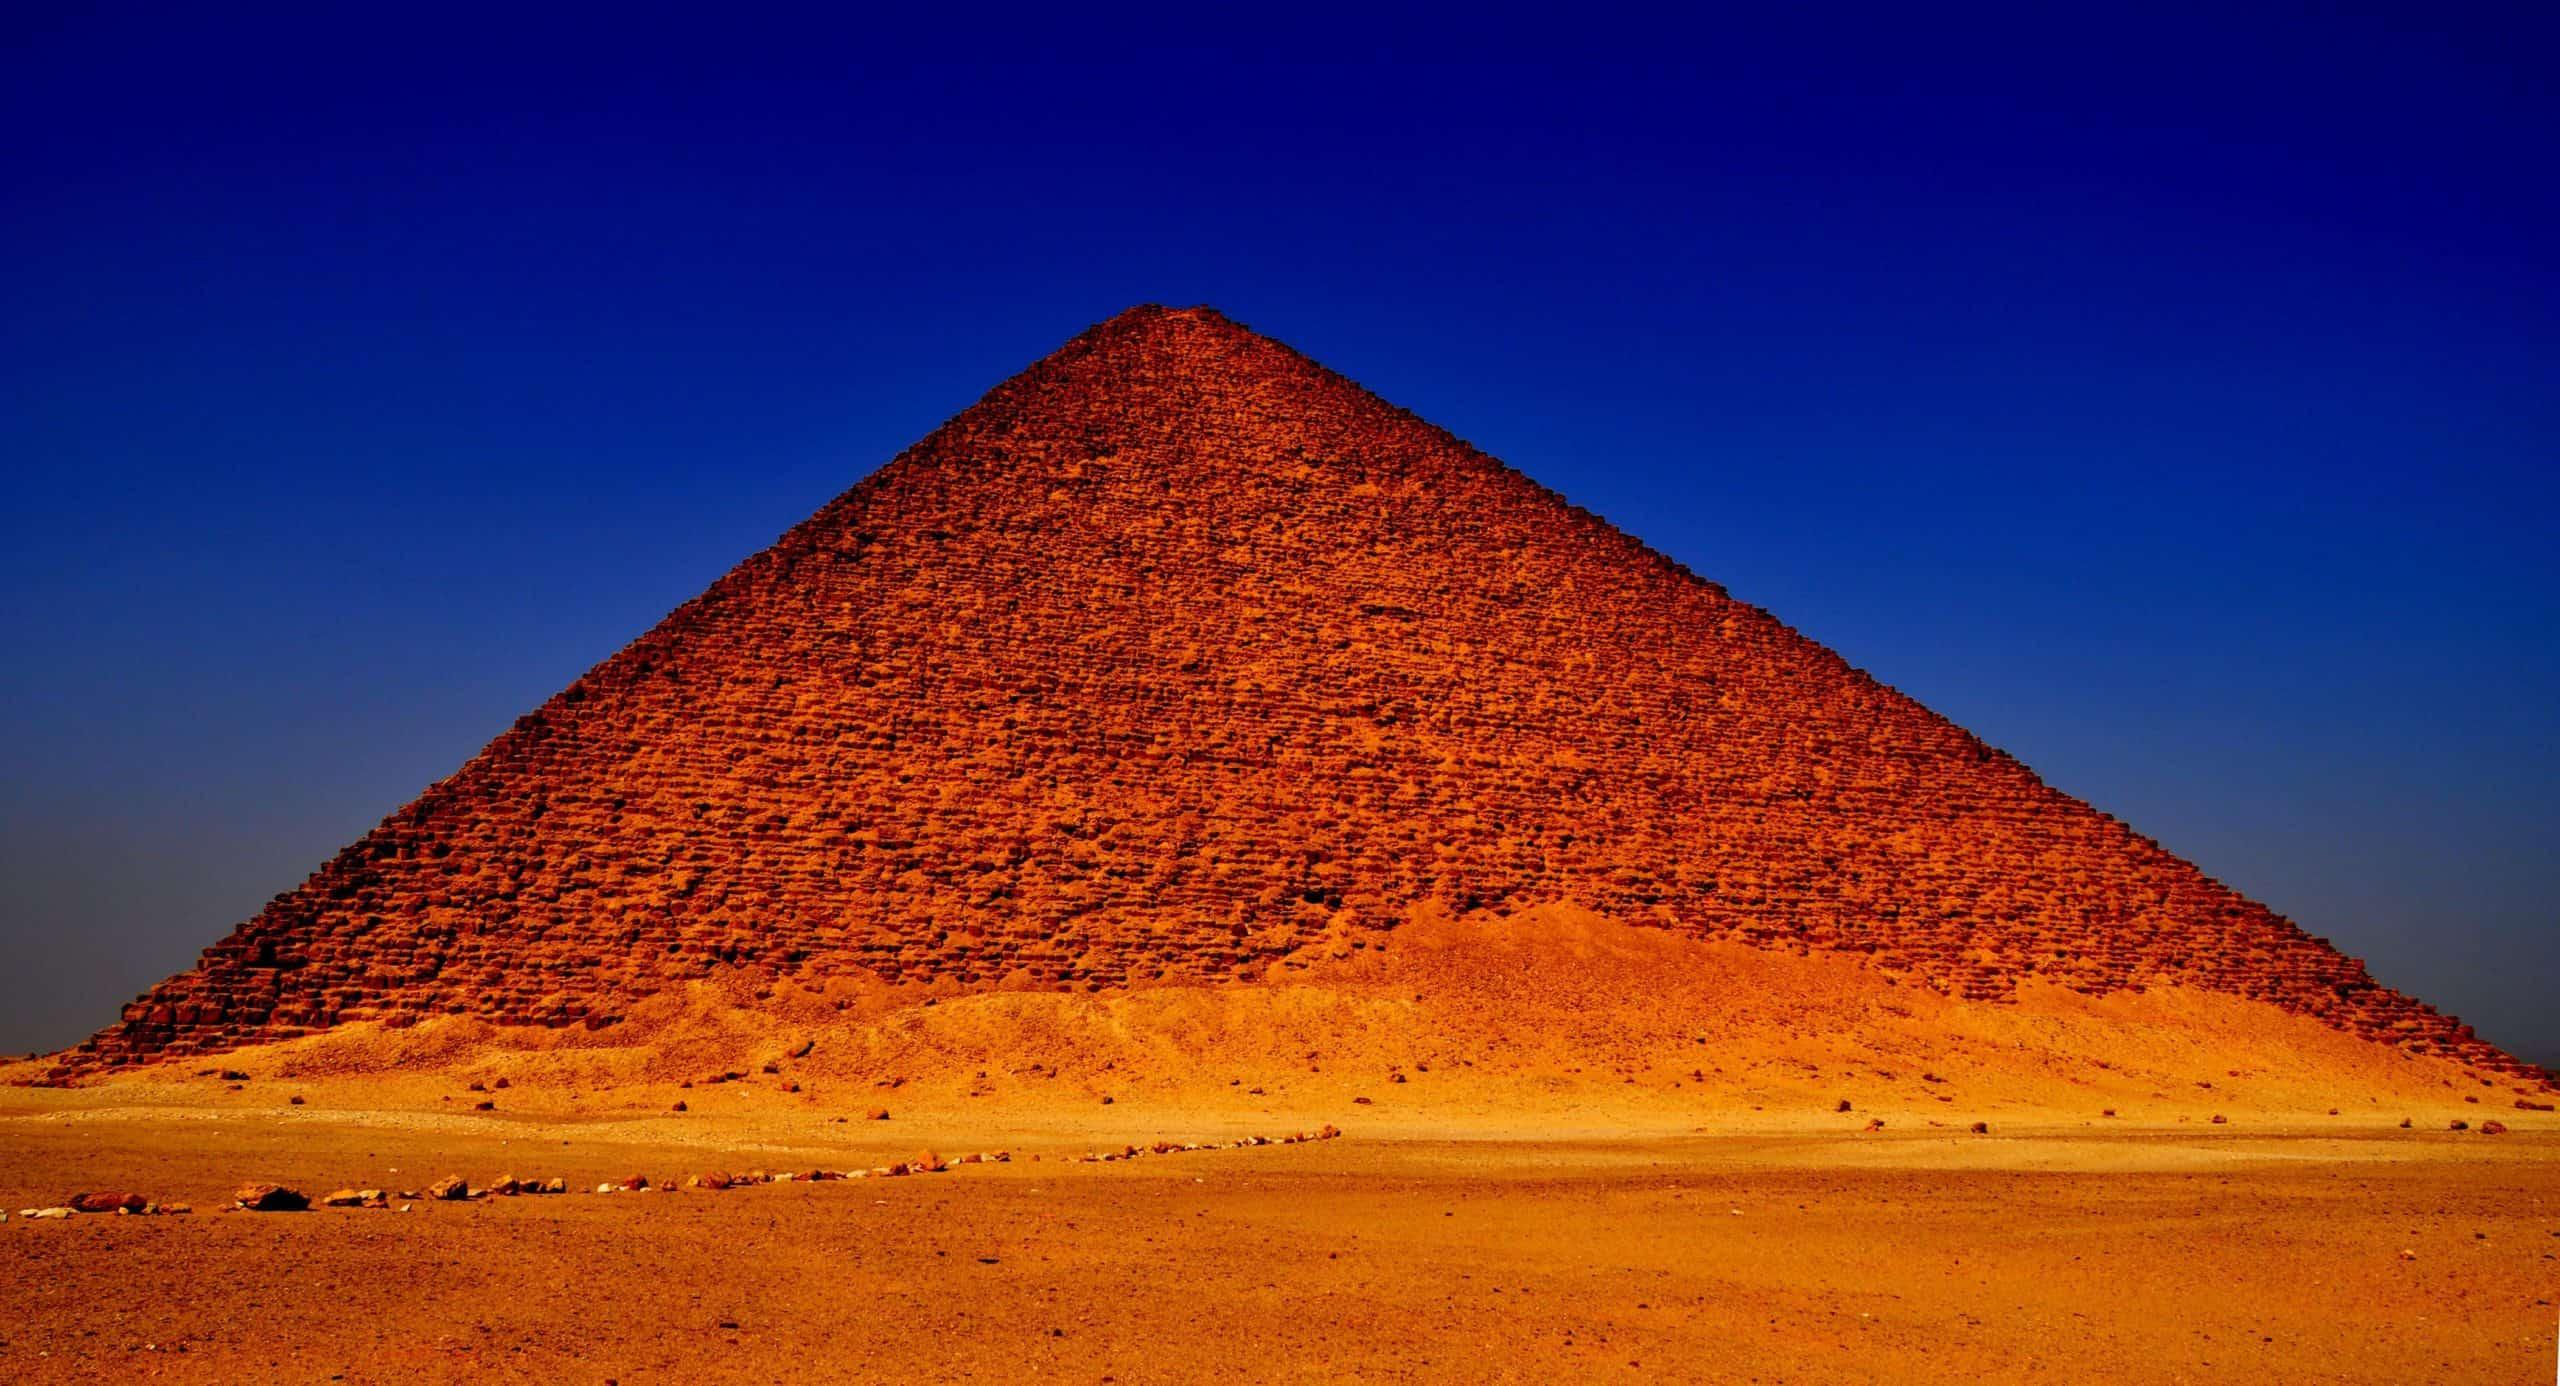 Pirámide Roja. Foto: Radio Viva 24